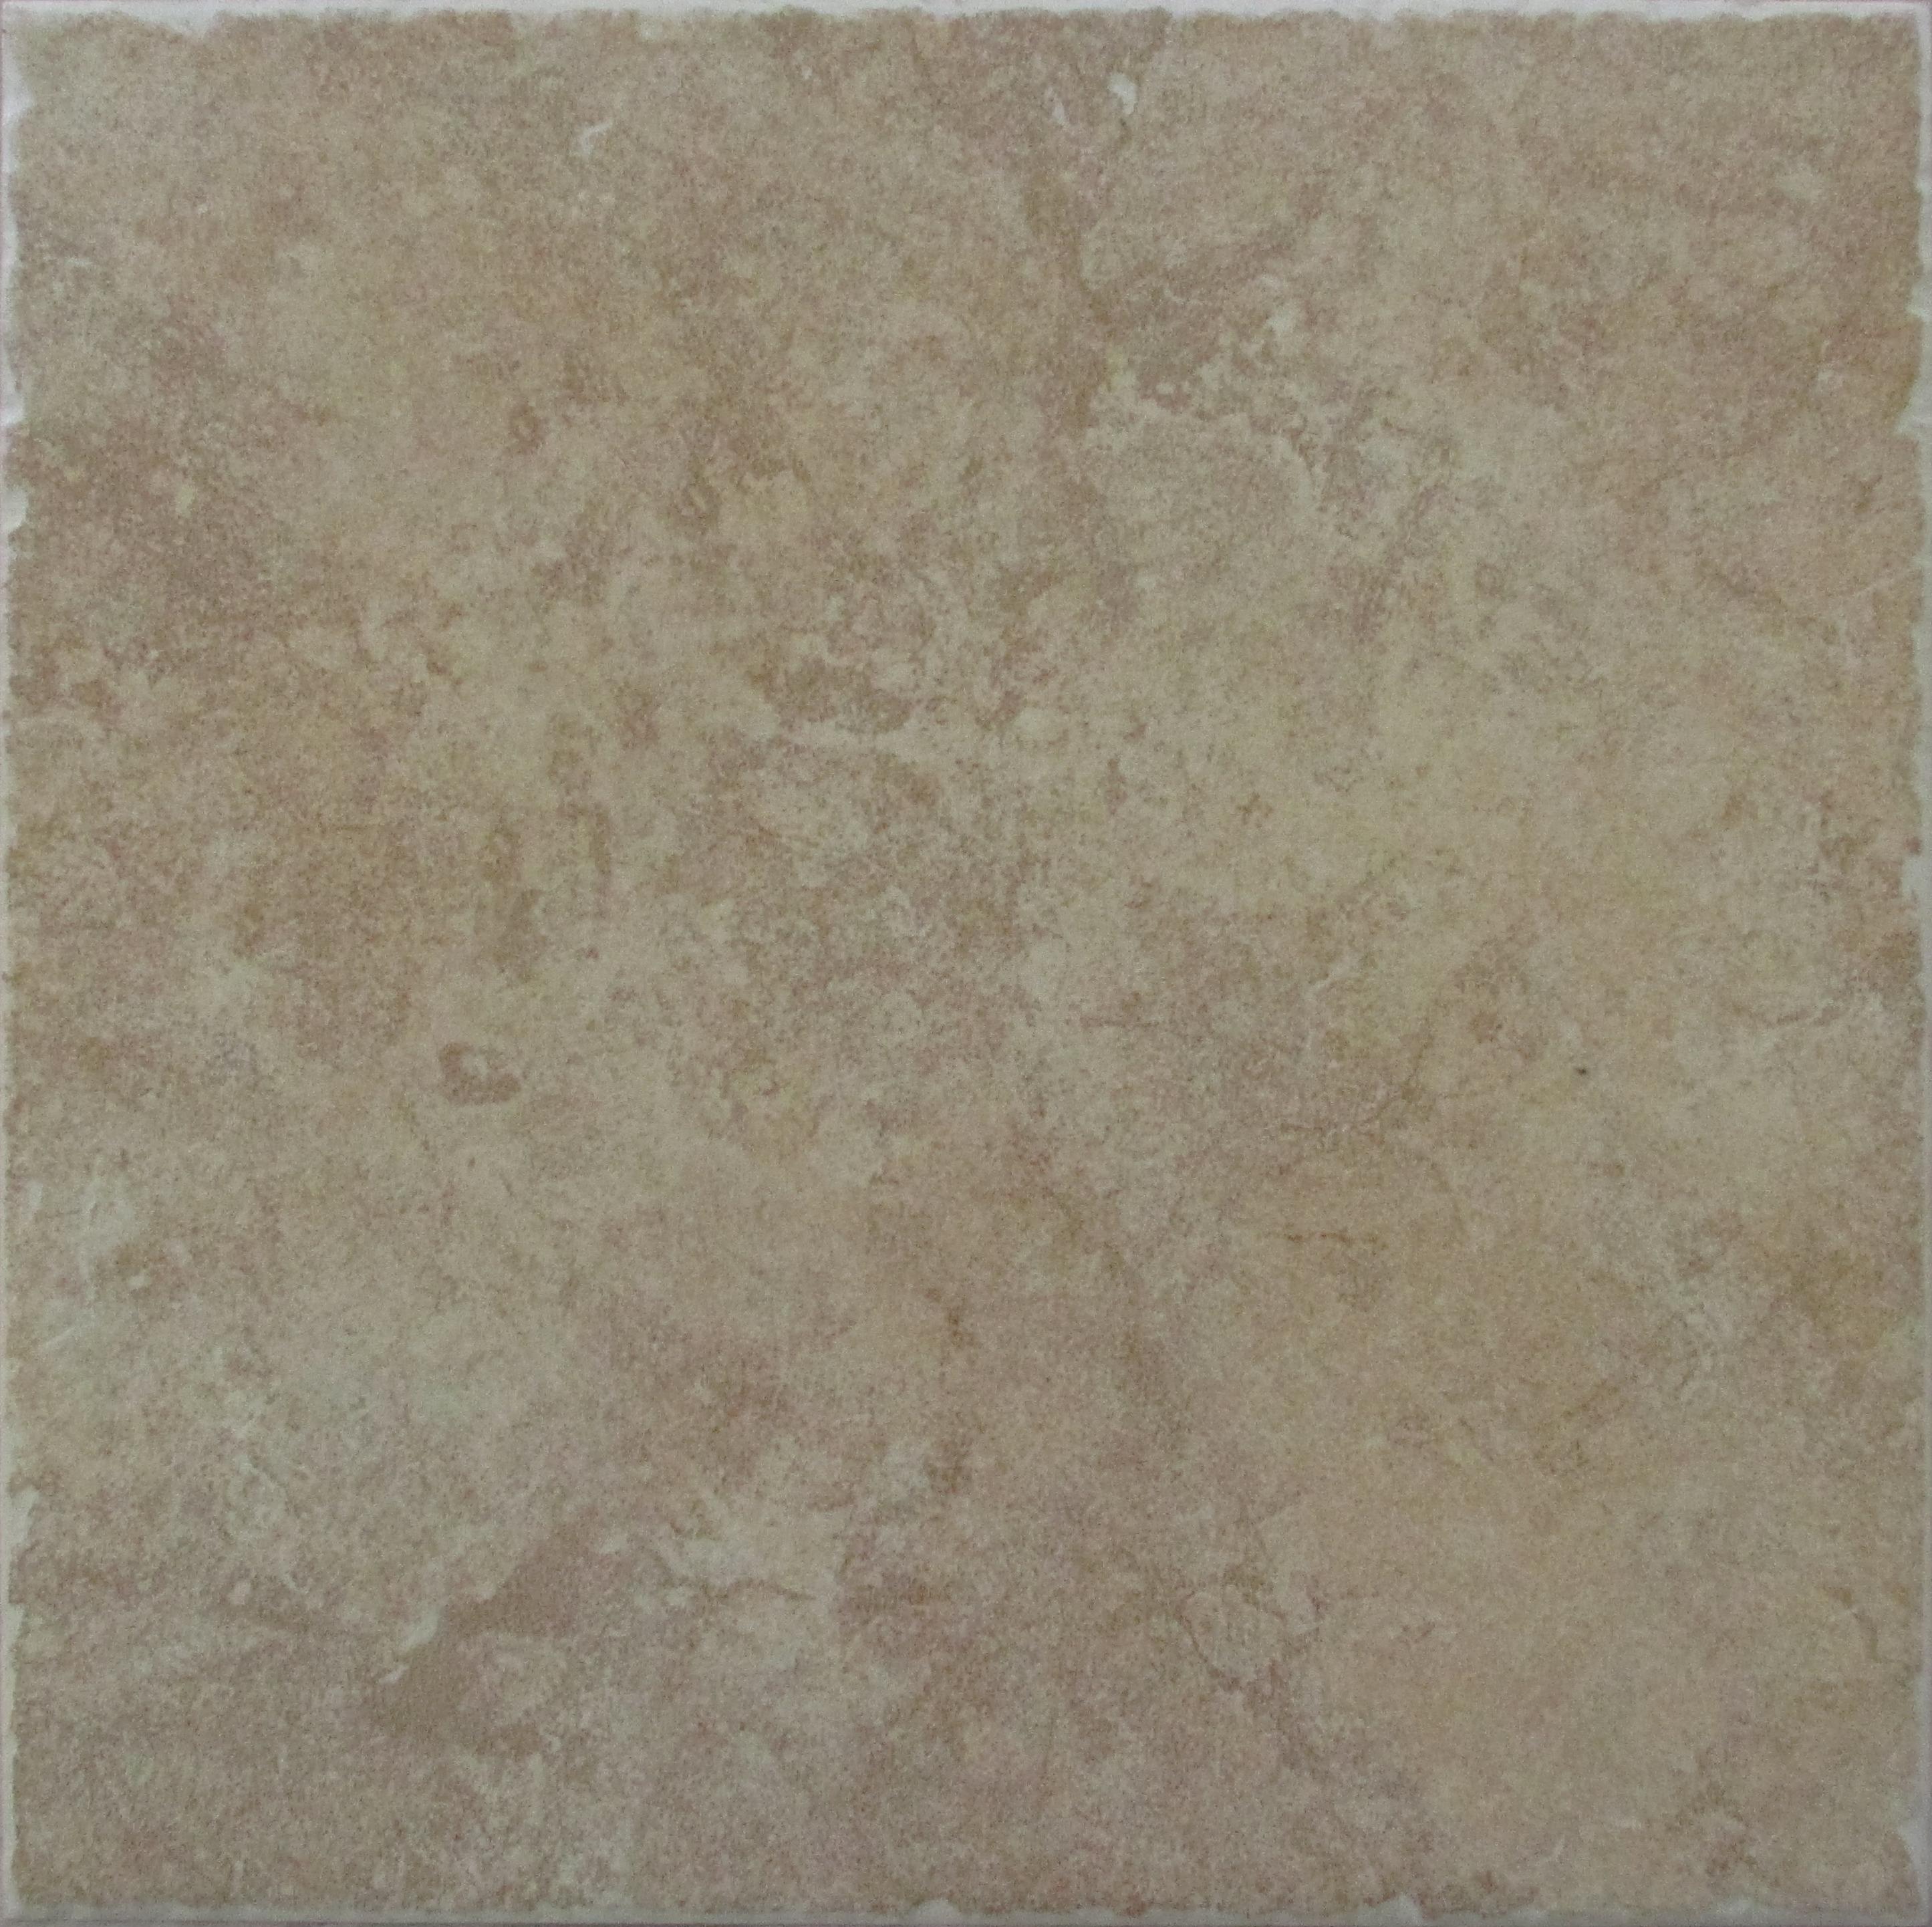 Free Images : floor, material, tiles, flooring, tile pattern ...